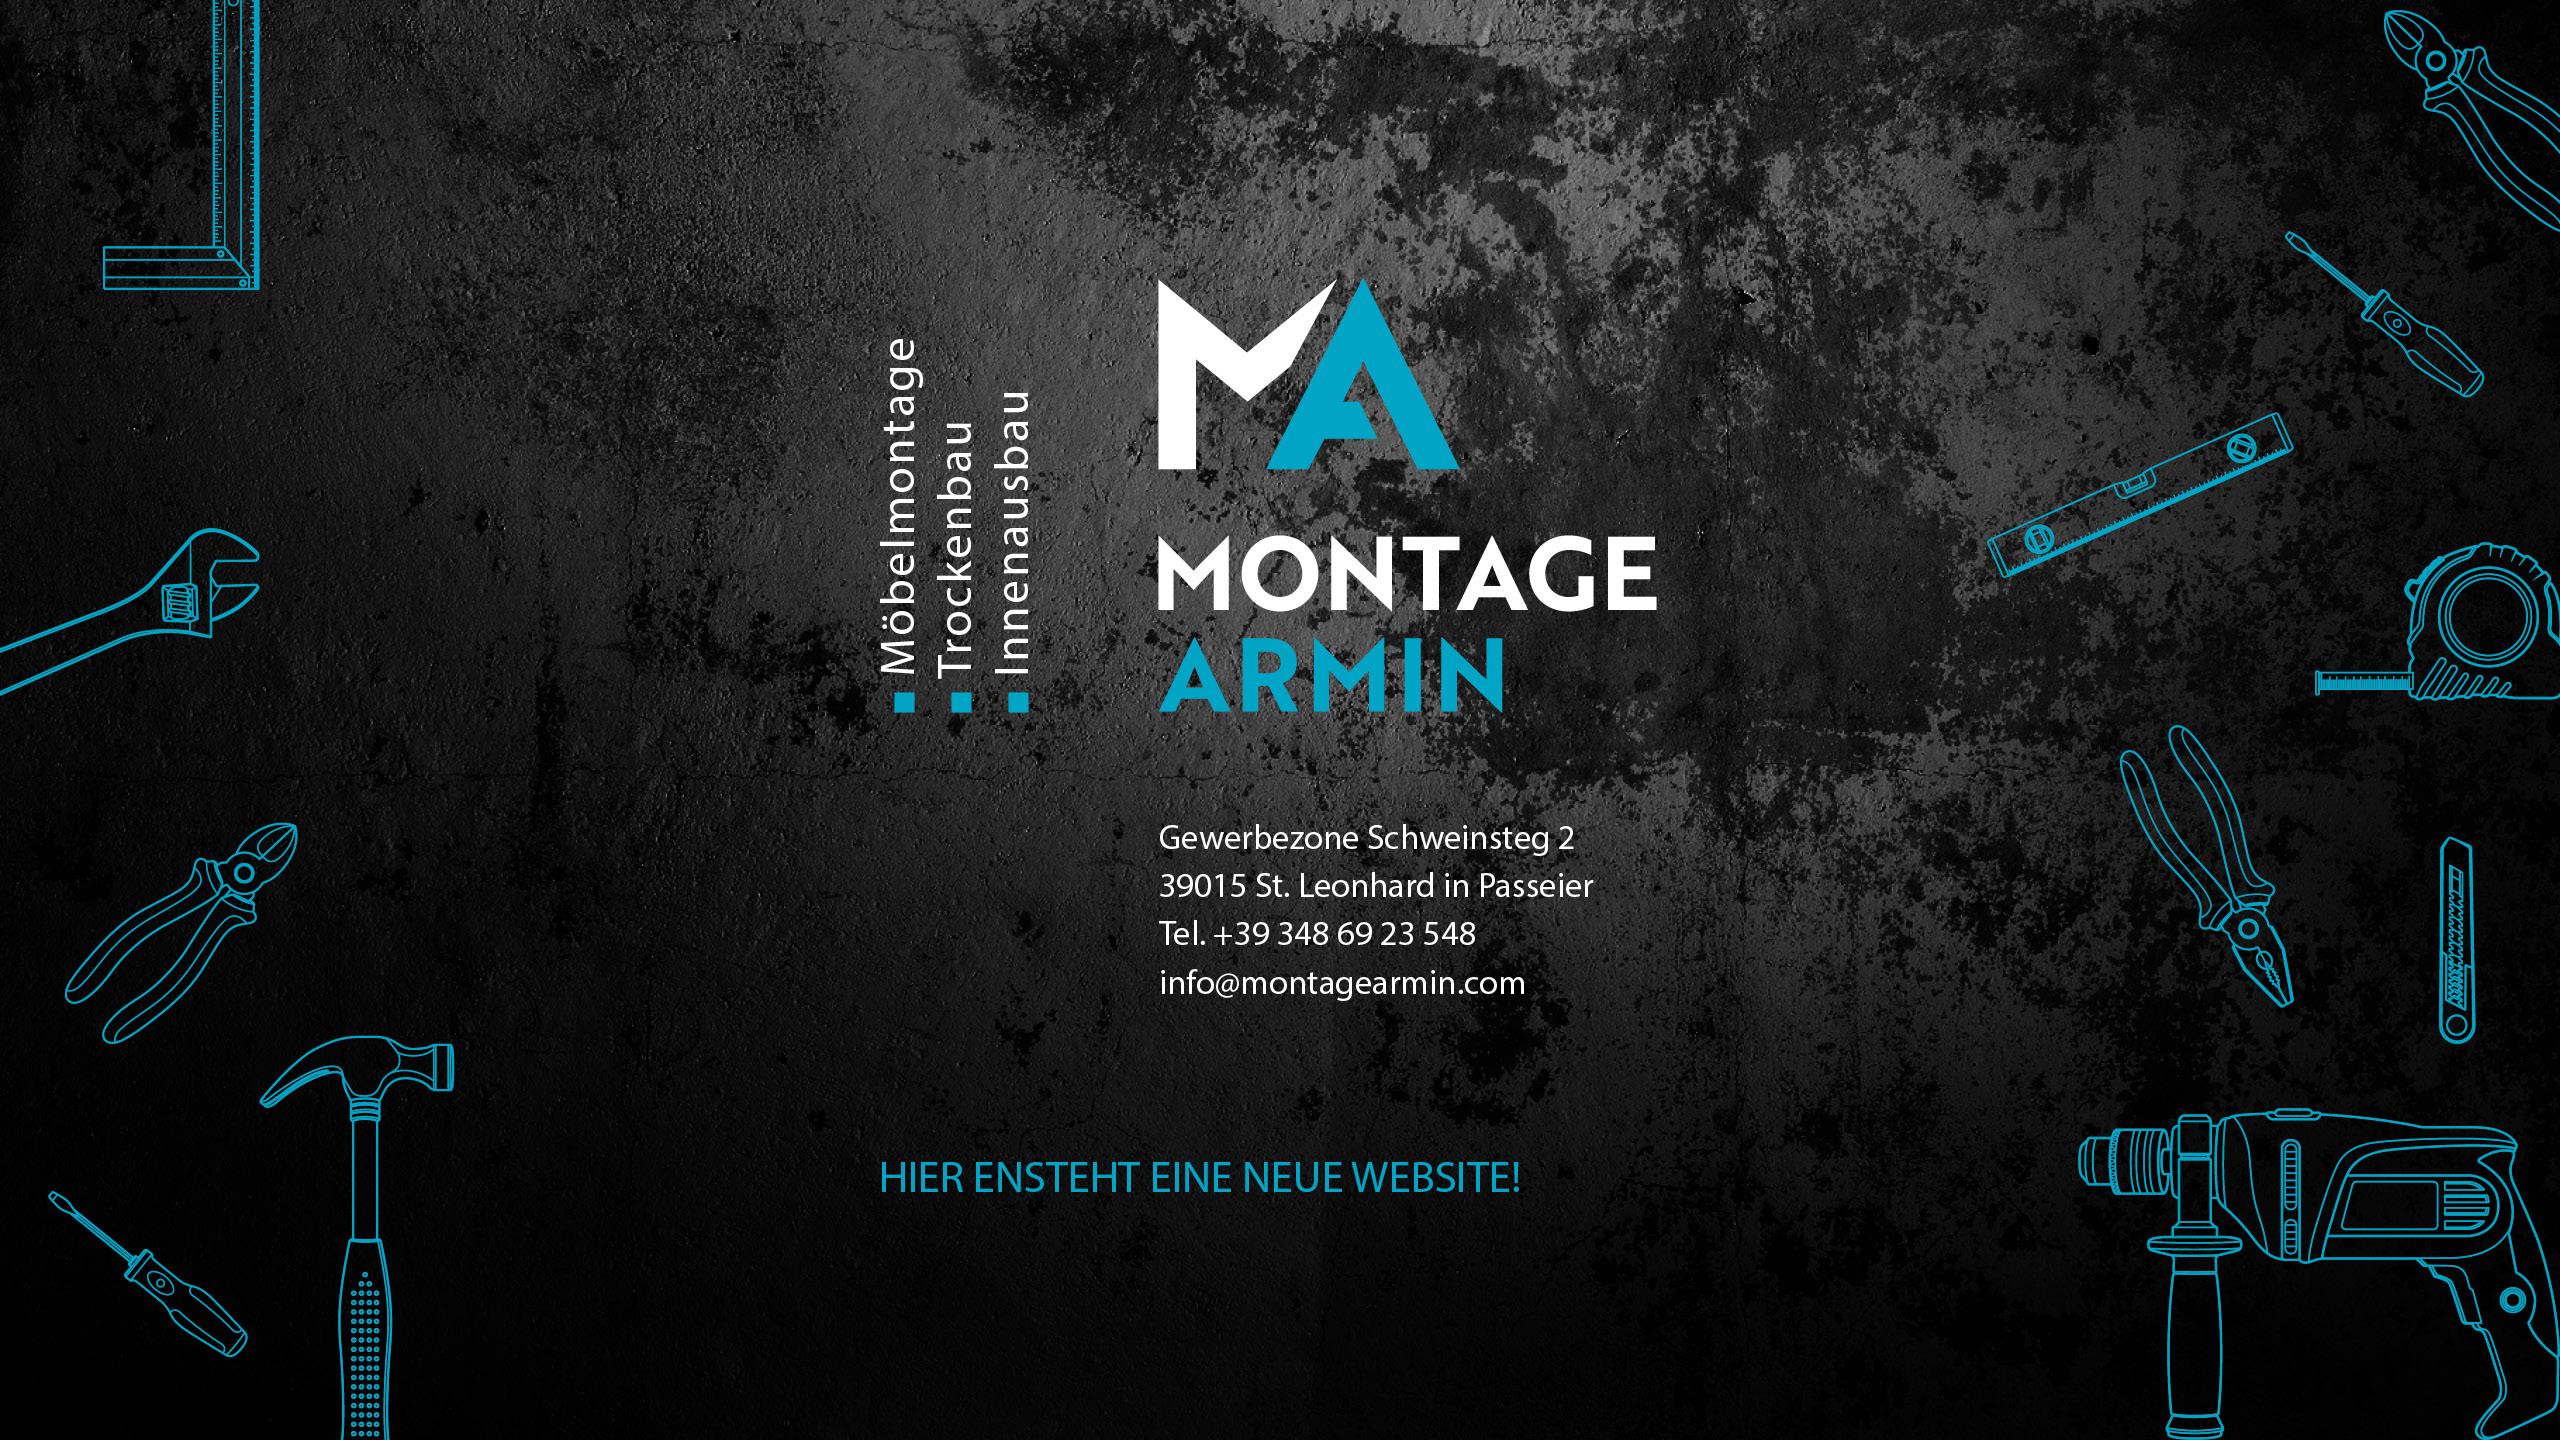 Montage Armin